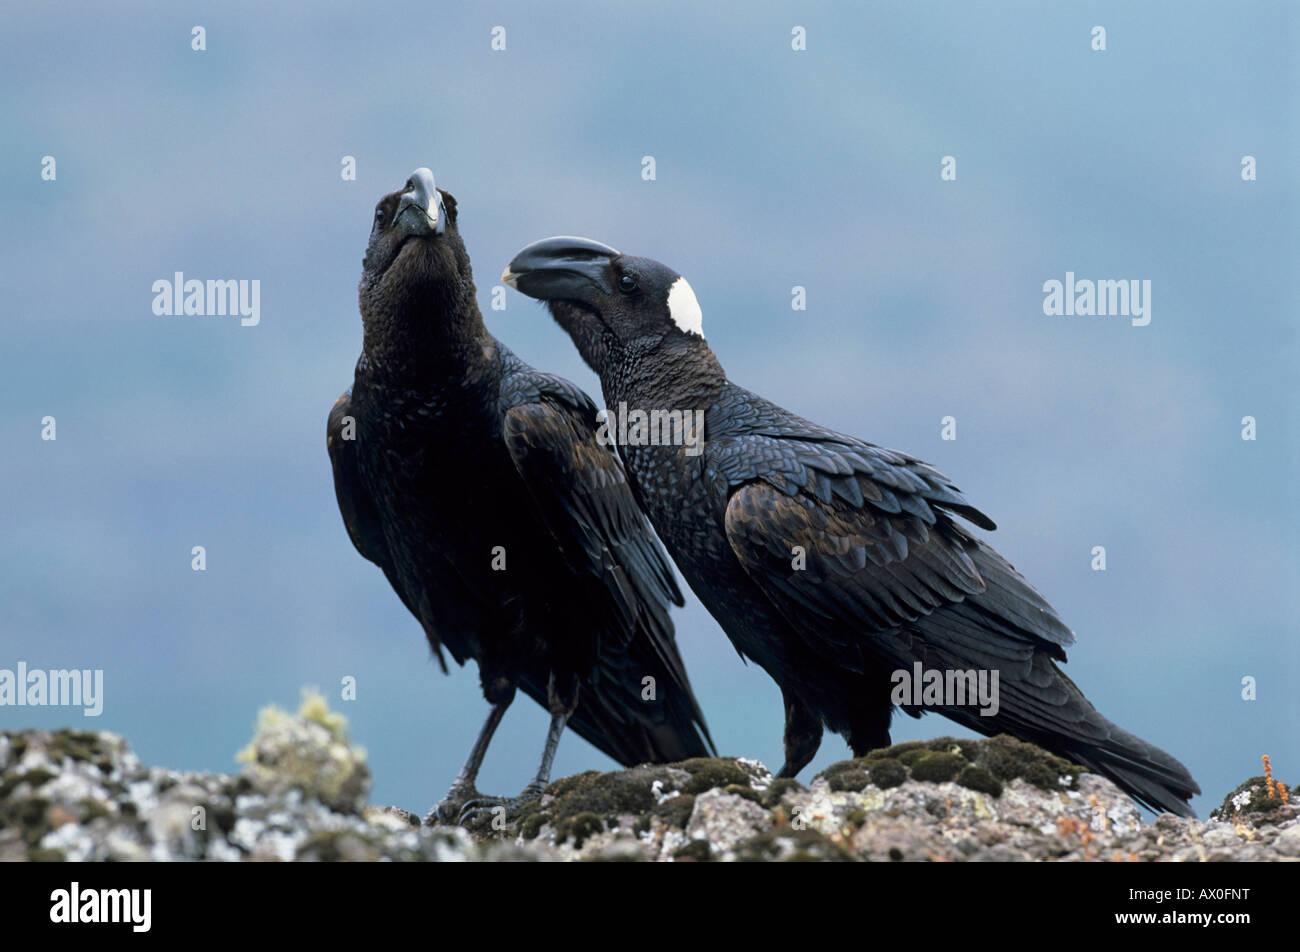 Pair of Thick-billed Raven (Corvus crasssirostris), Semien Mountain Natinal Park, Ethiopian - Stock Image